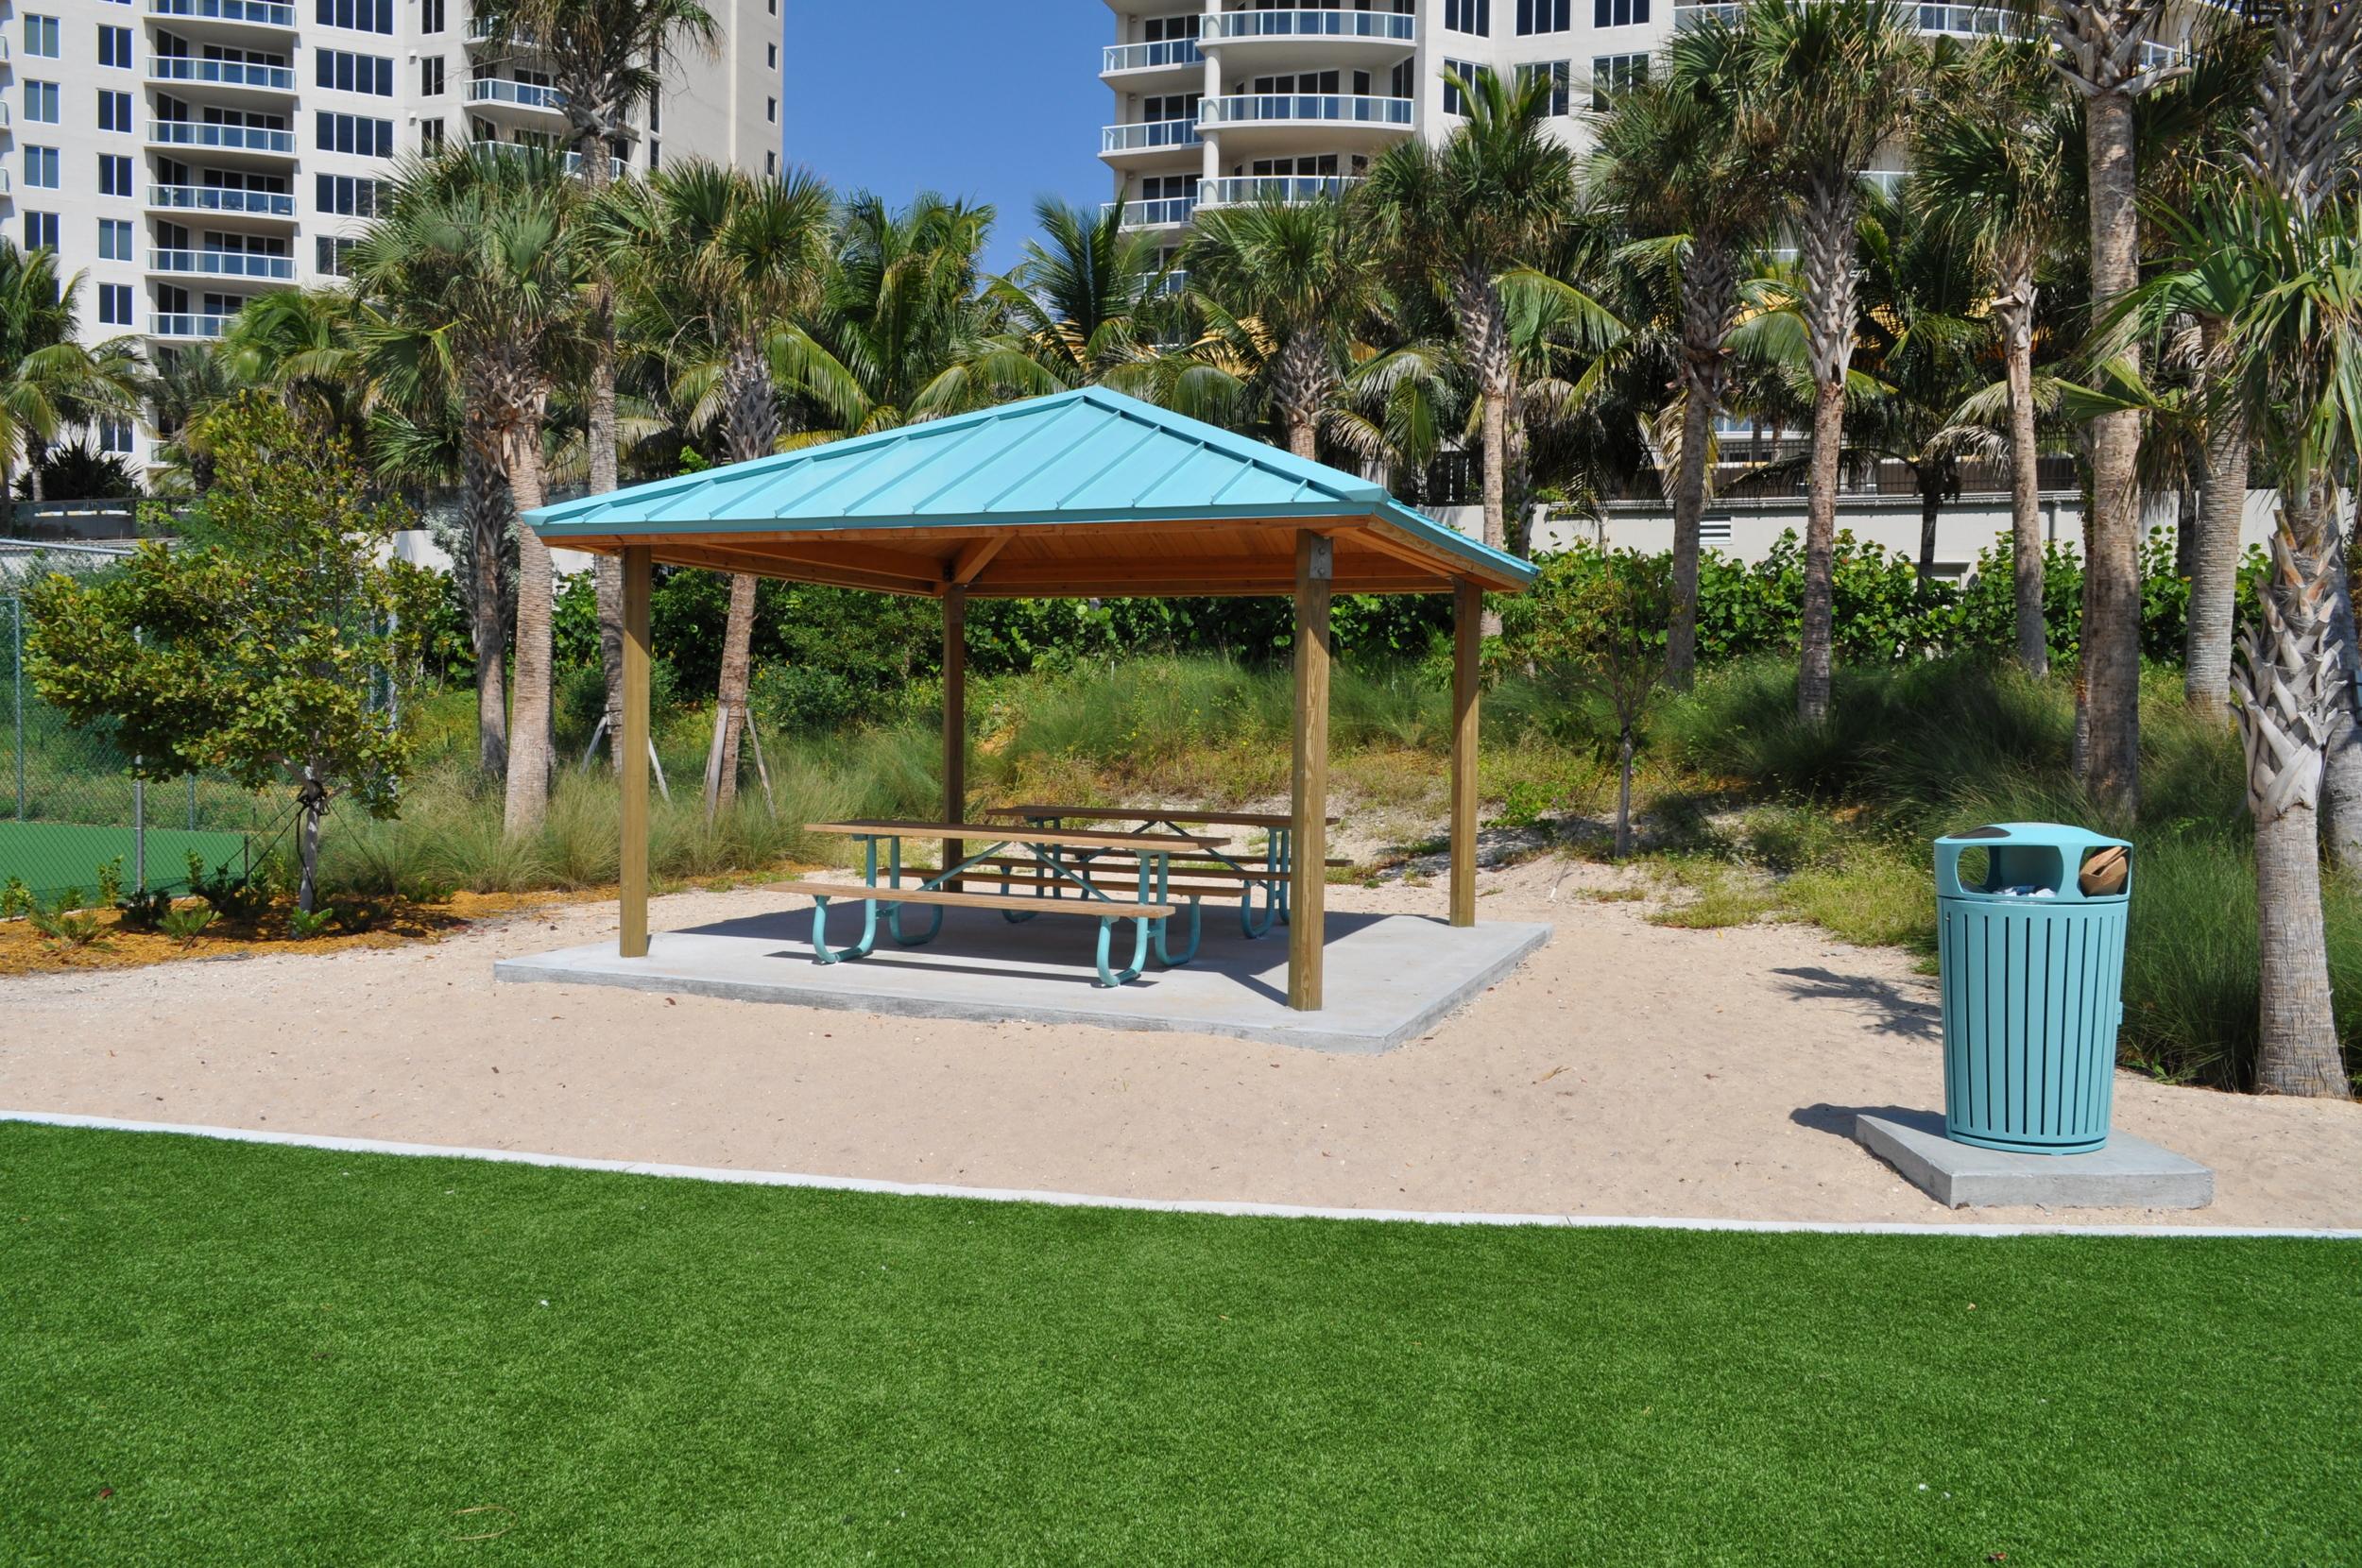 City of Riviera Beach Municipal Beach Park Ocean Mall Picnic Pavallion.jpg